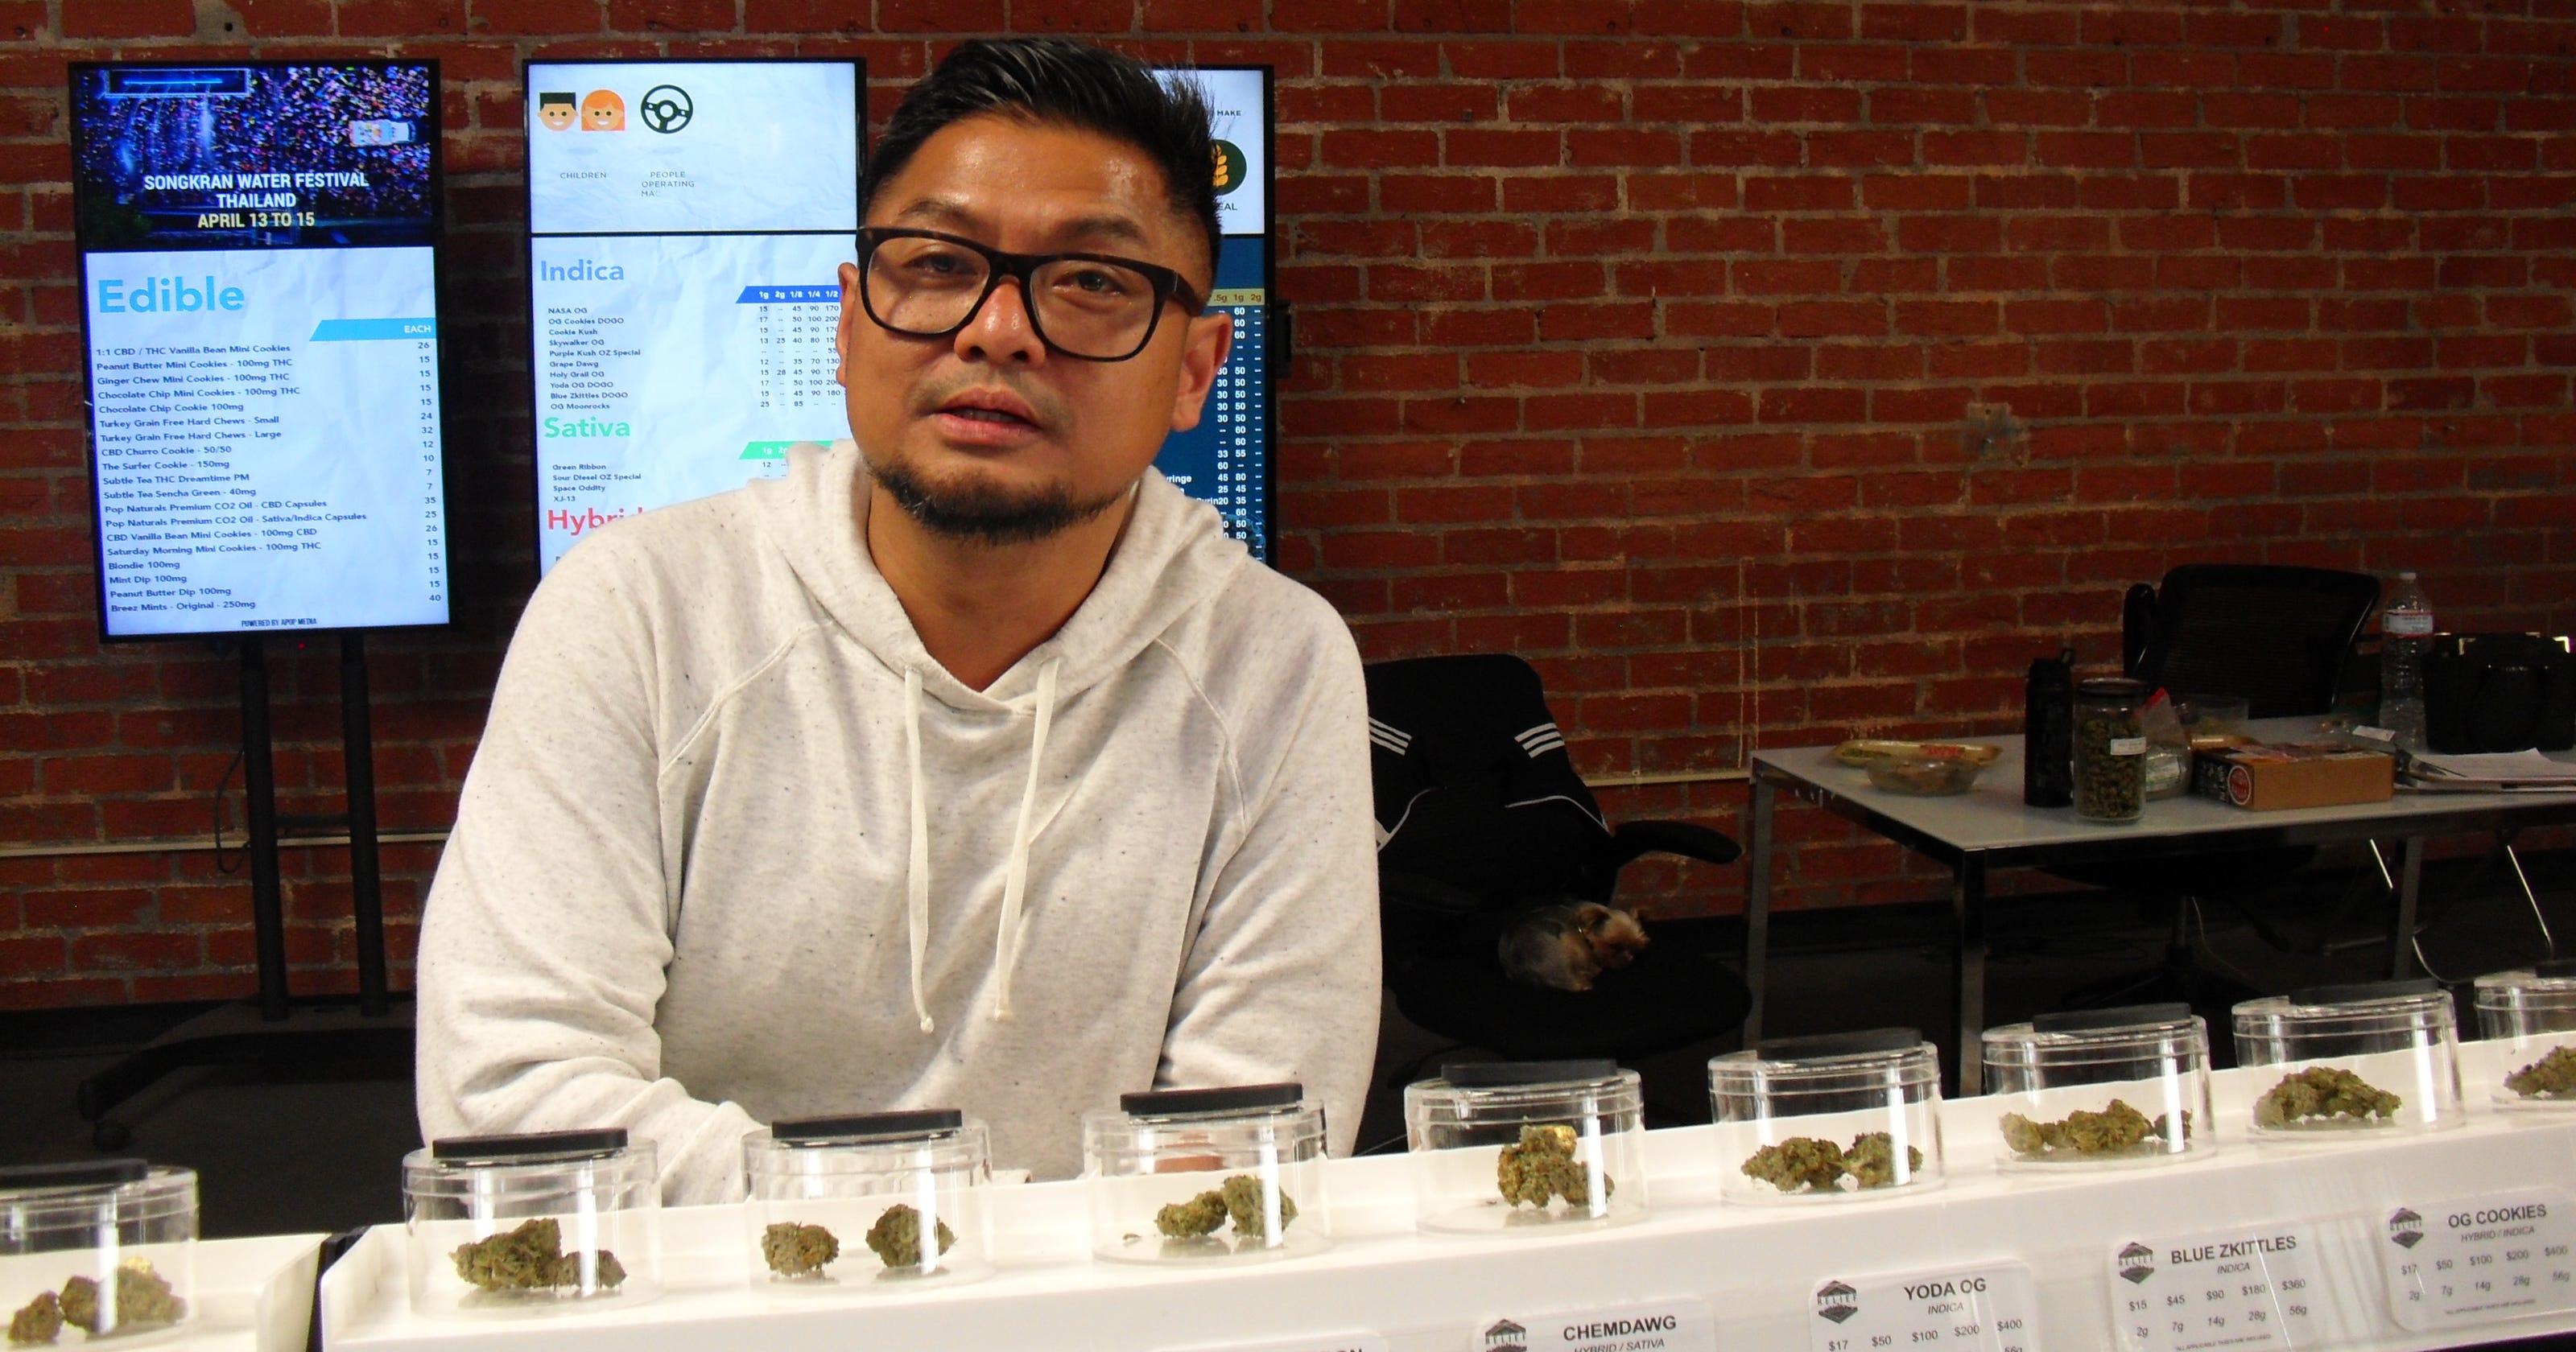 Entrepreneurs look to cash in on marijuana edibles, weed